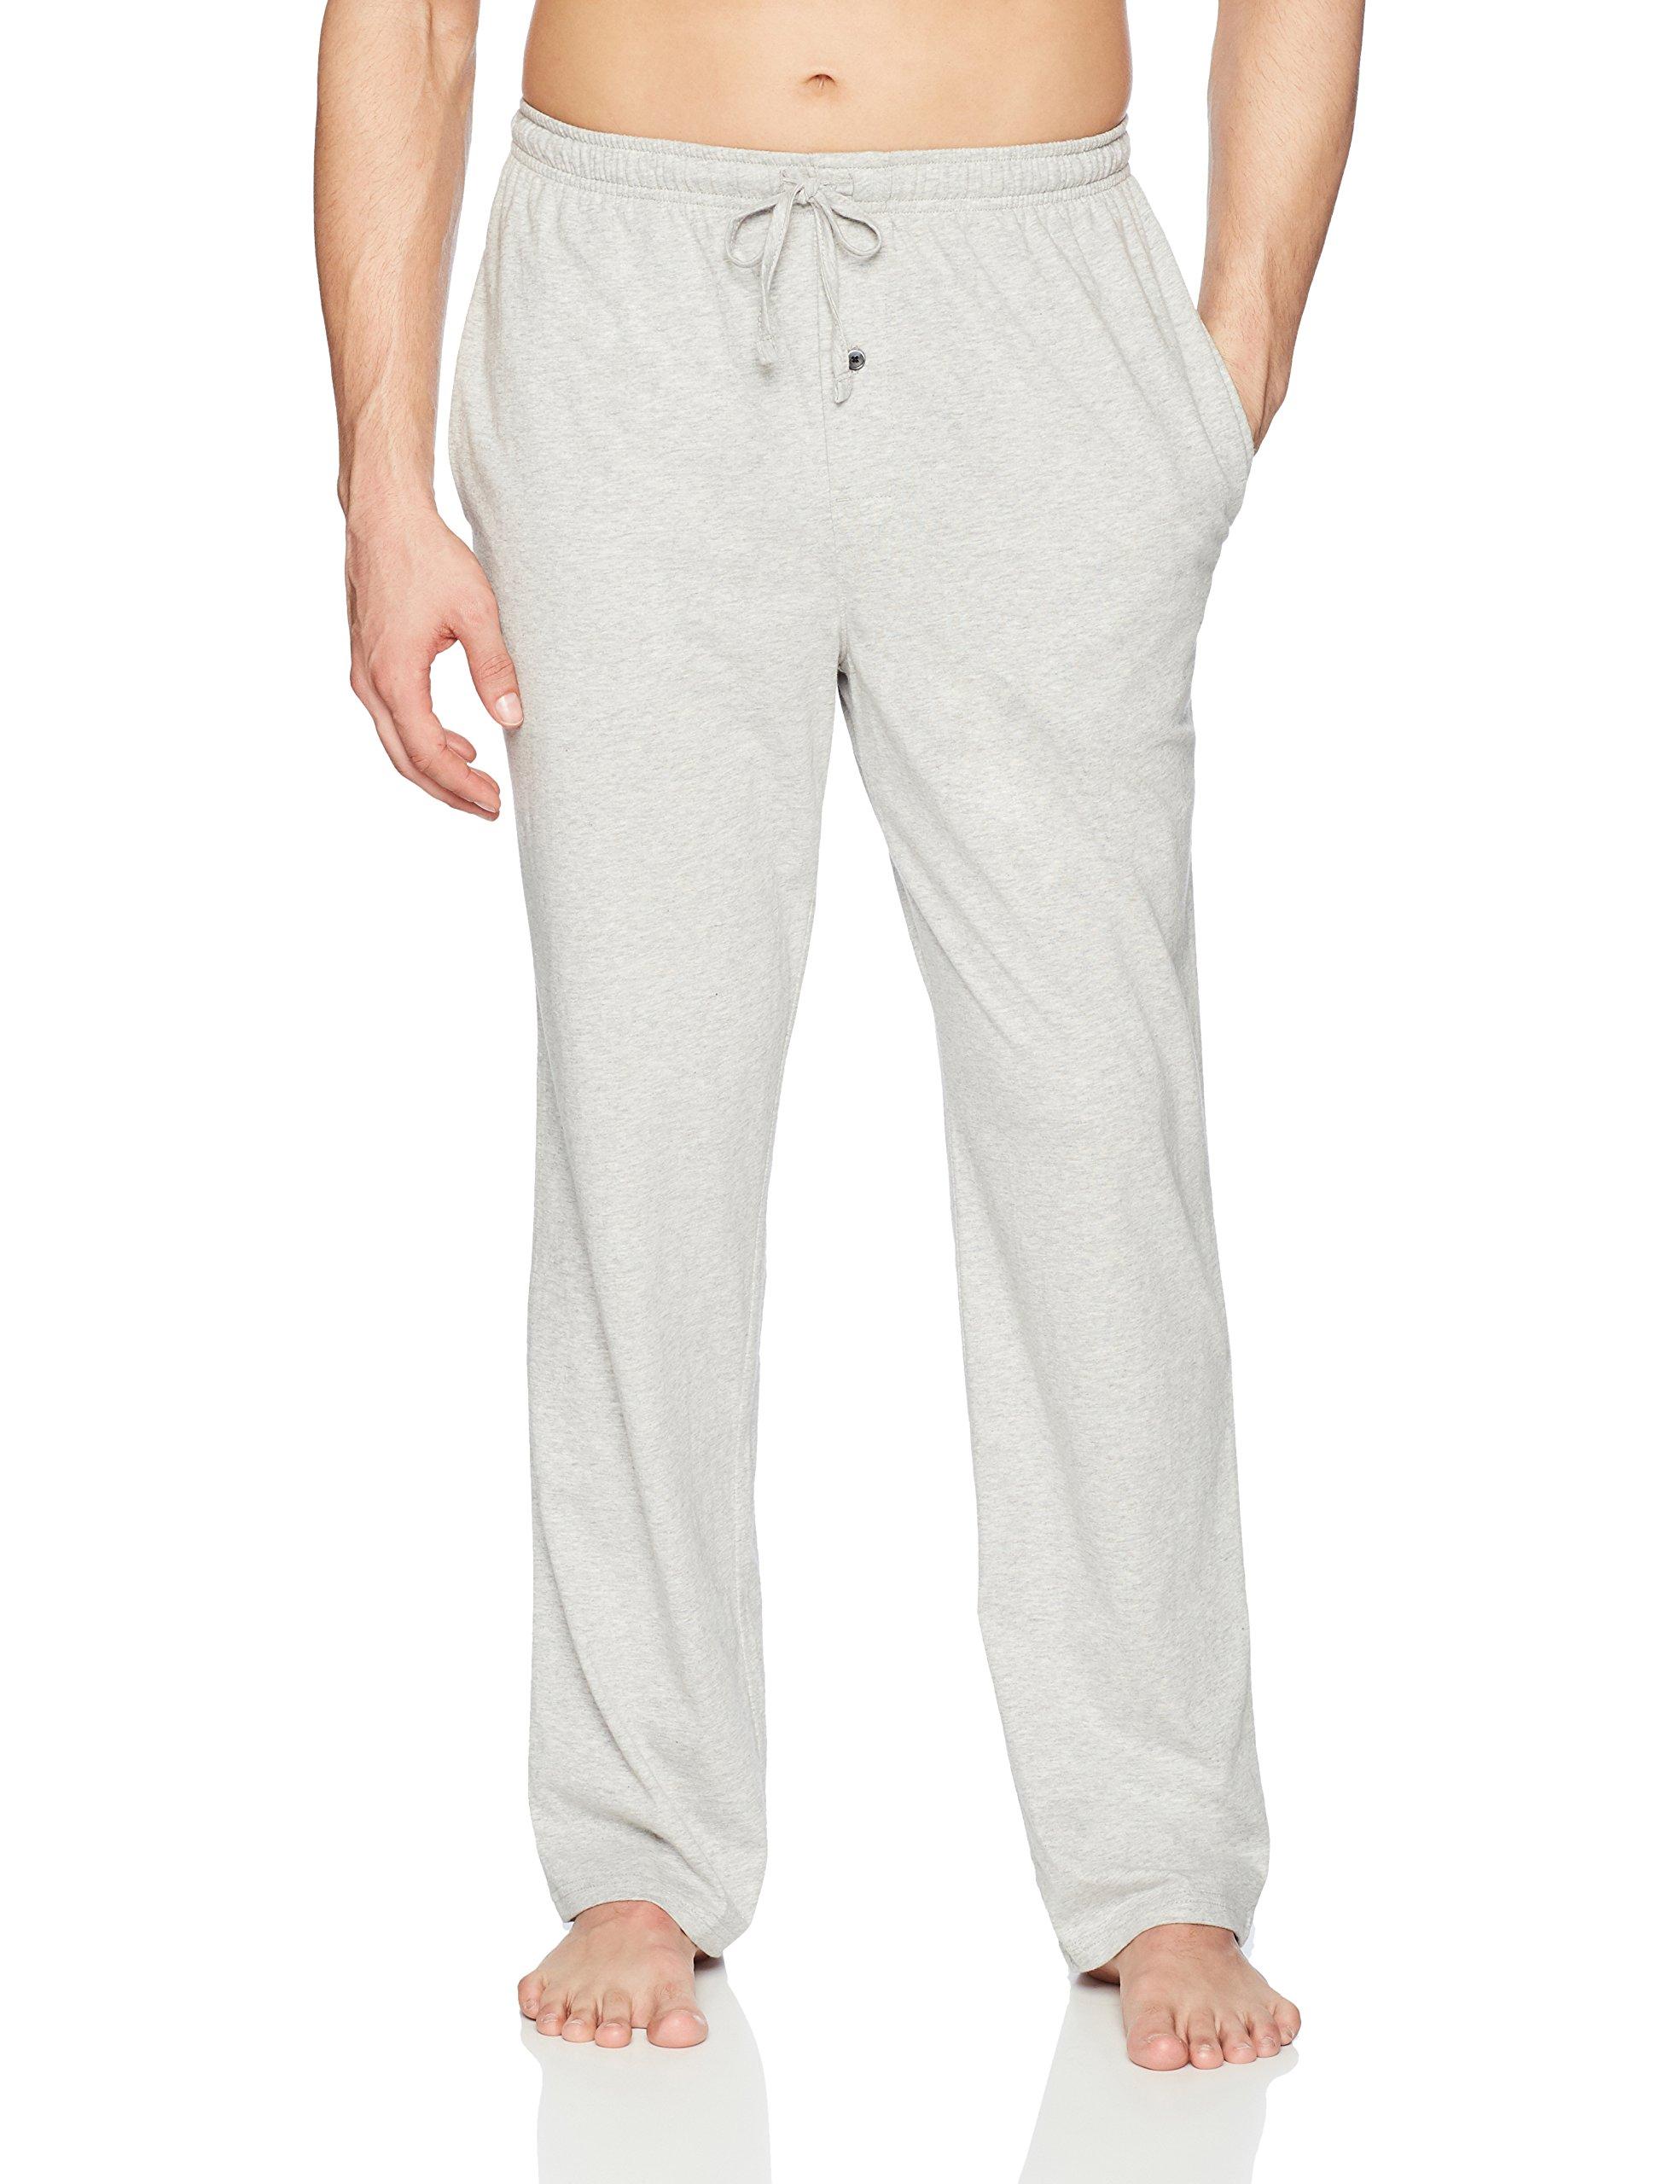 Amazon Essentials Men's Knit Pajama Pant, Light Grey Heather, Small